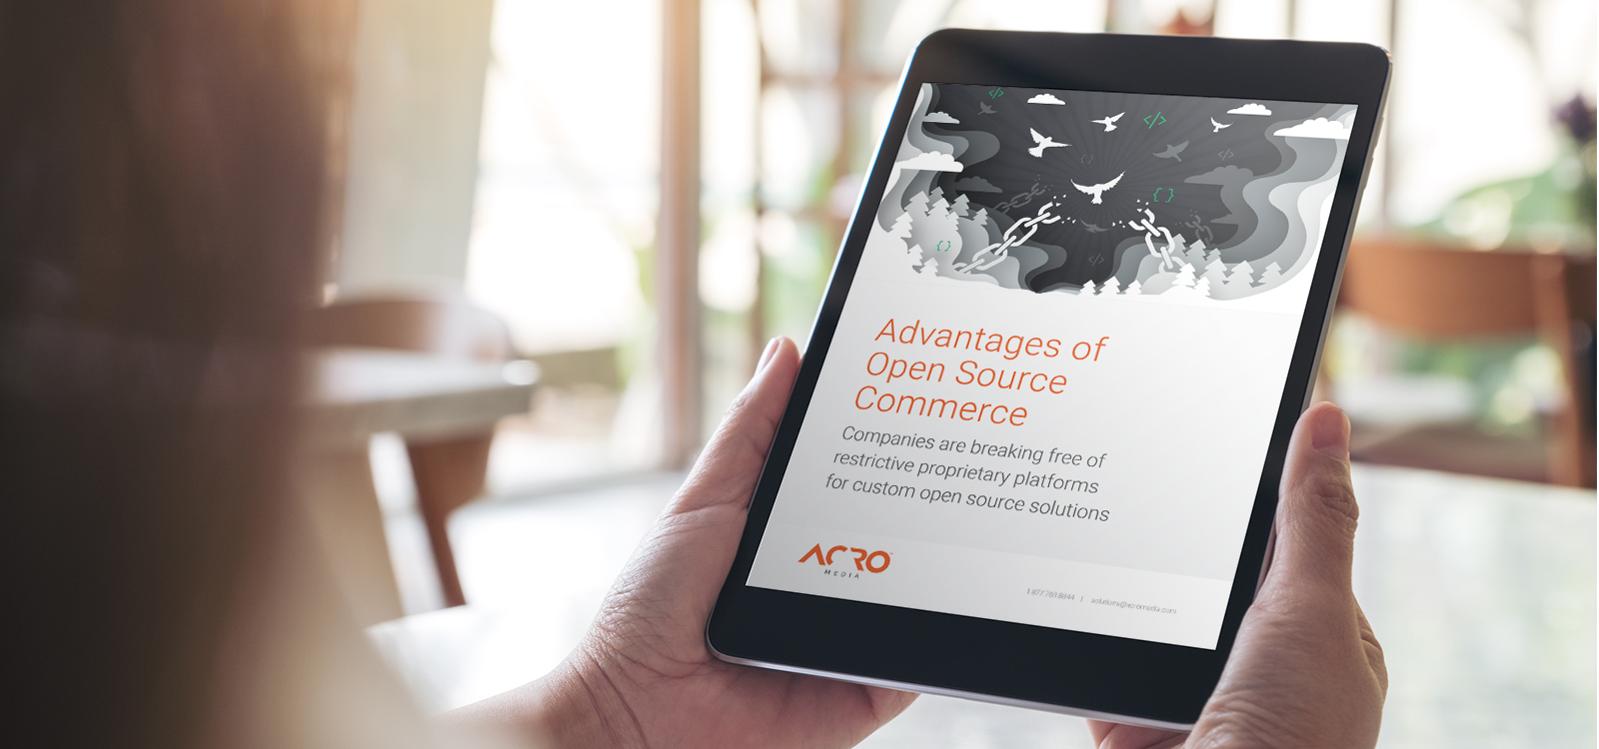 Advantages of Open Source Commerce | Acro Media